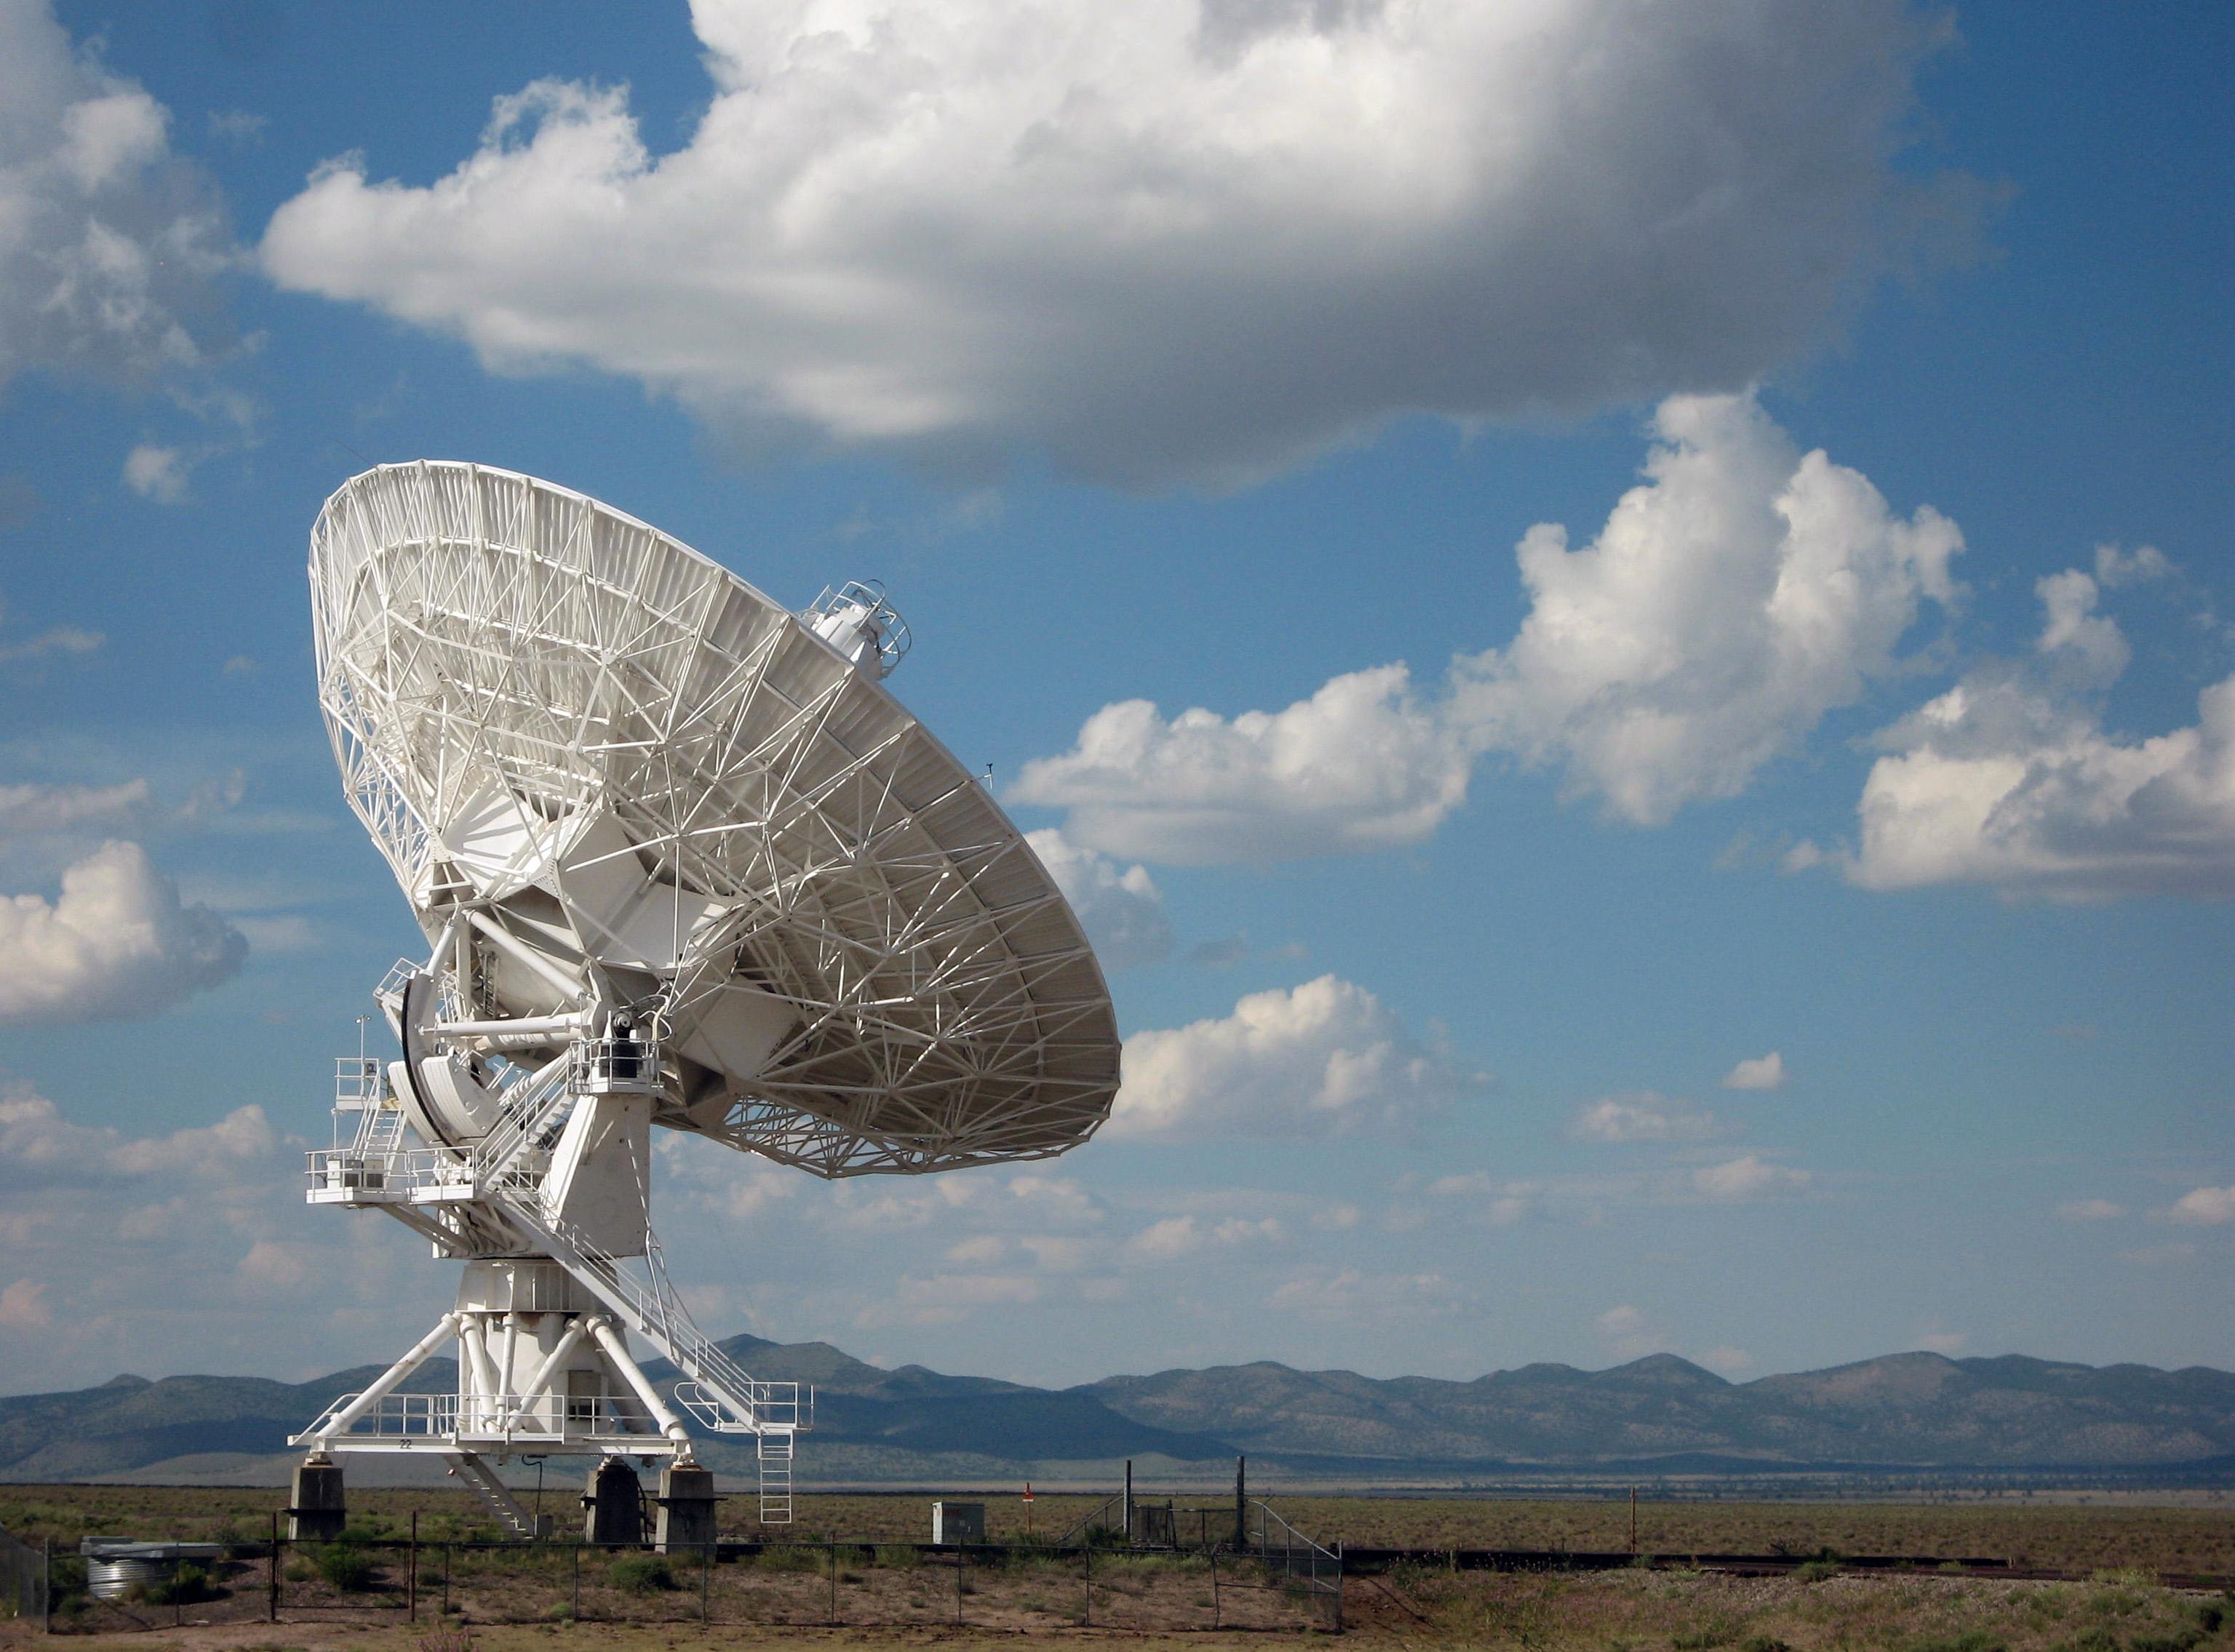 Massive satellite dish in the desert